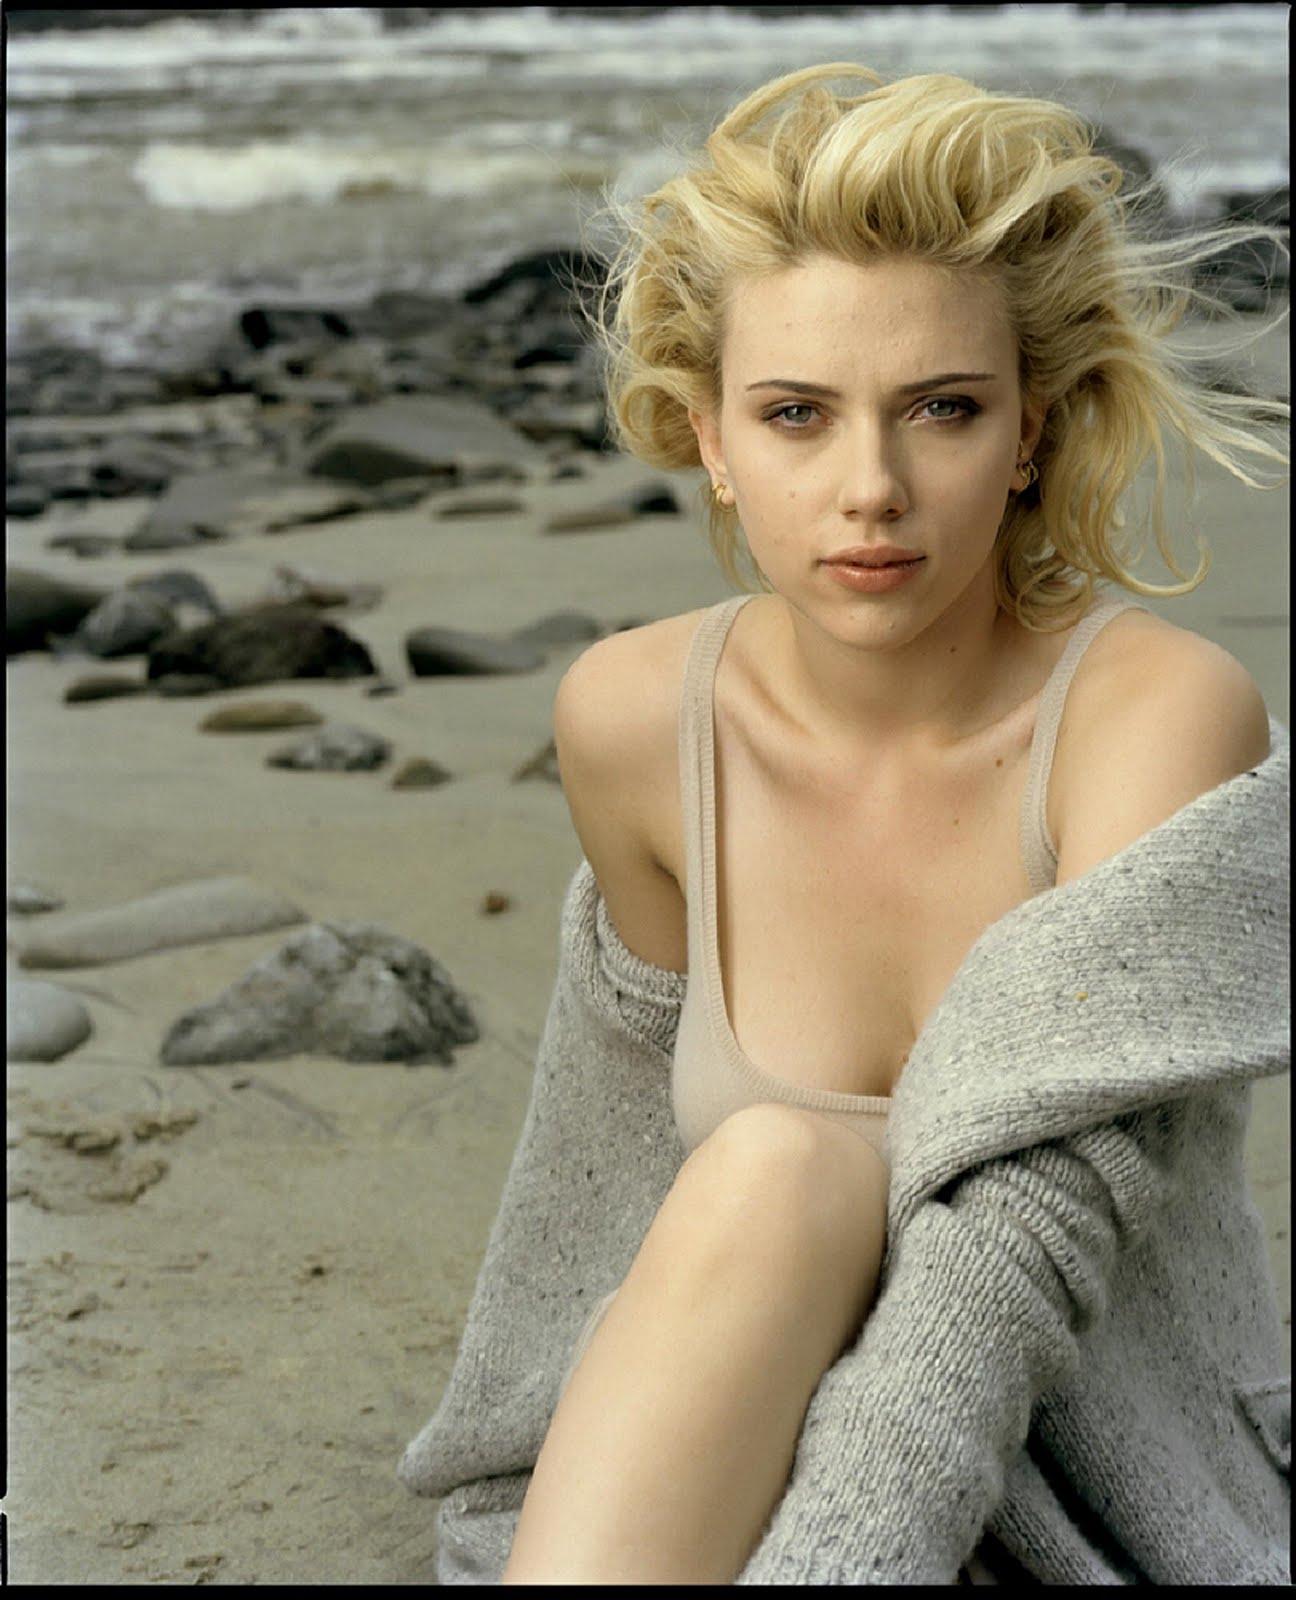 http://3.bp.blogspot.com/_cyH_7sPxVcQ/TD3sWNO7RnI/AAAAAAAADW4/jcBZ-3Yf0XU/s1600/Scarlett+Johansson+in+Beautiful+Beach+Photoshoot+by+Annie+Leibovitz+%282%29.jpg